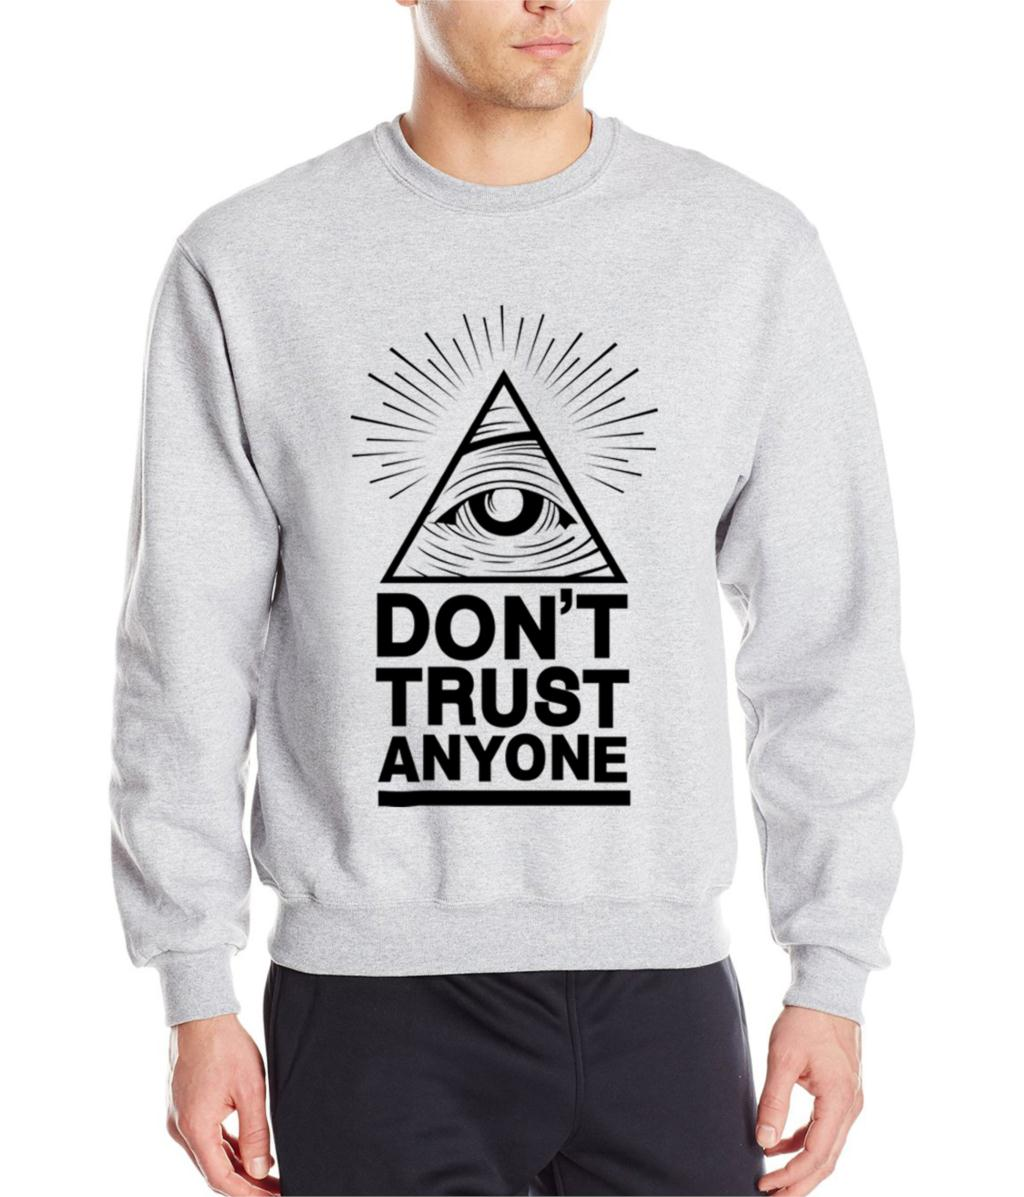 New 2017 Fashion Don't Trust Anyone Autumn Winter Tracksuit Men Hoodies Hip Hop Sportwear Sweatshirts Male Harajuku Kpop Hoodies